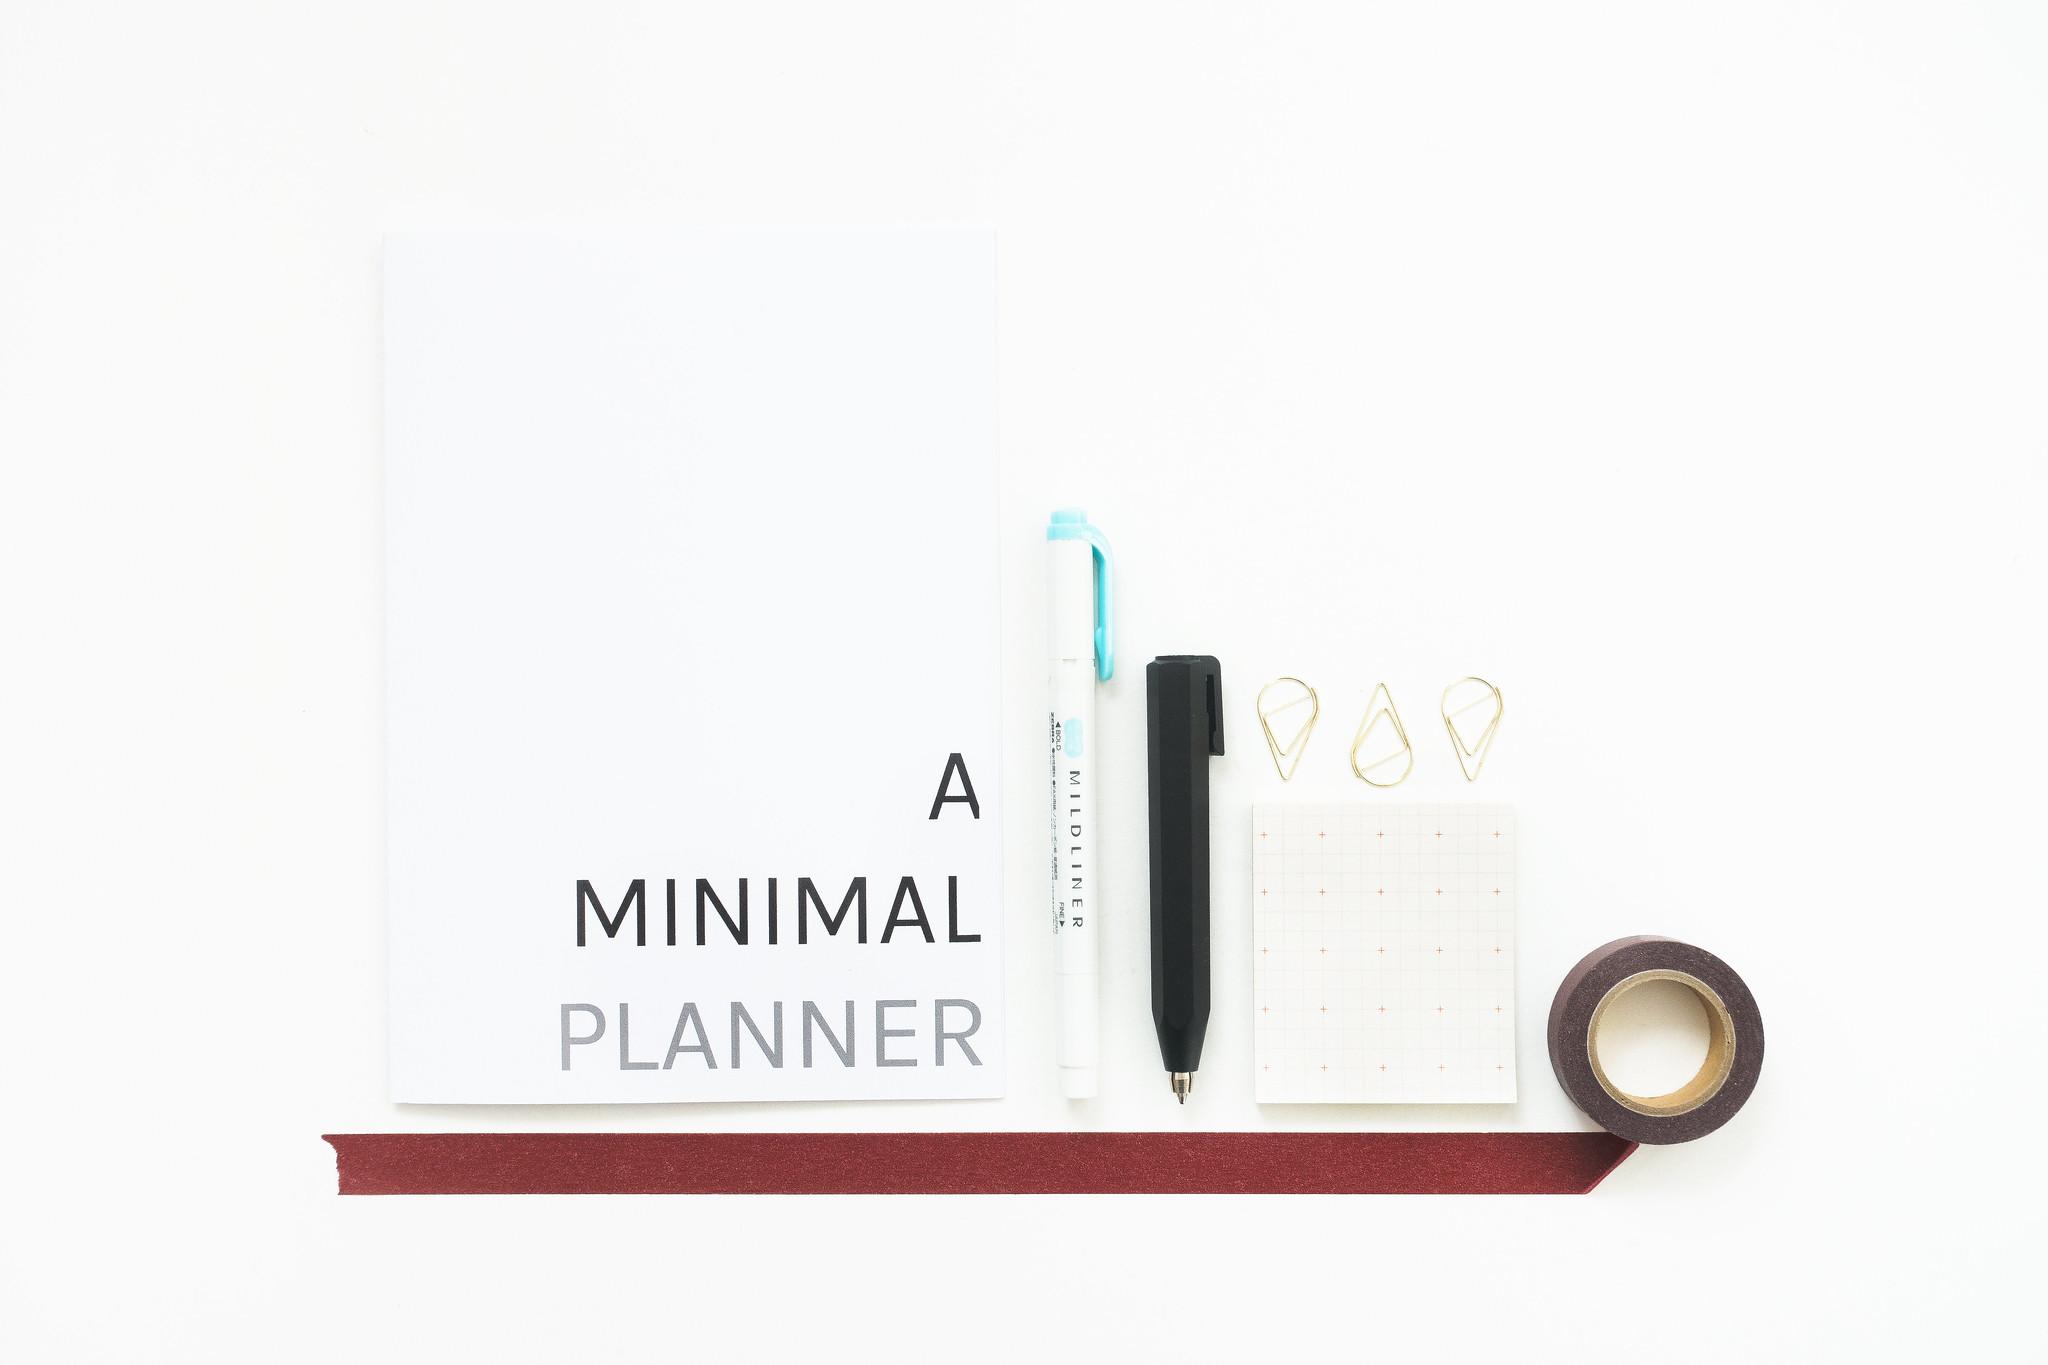 A Minimal Planner